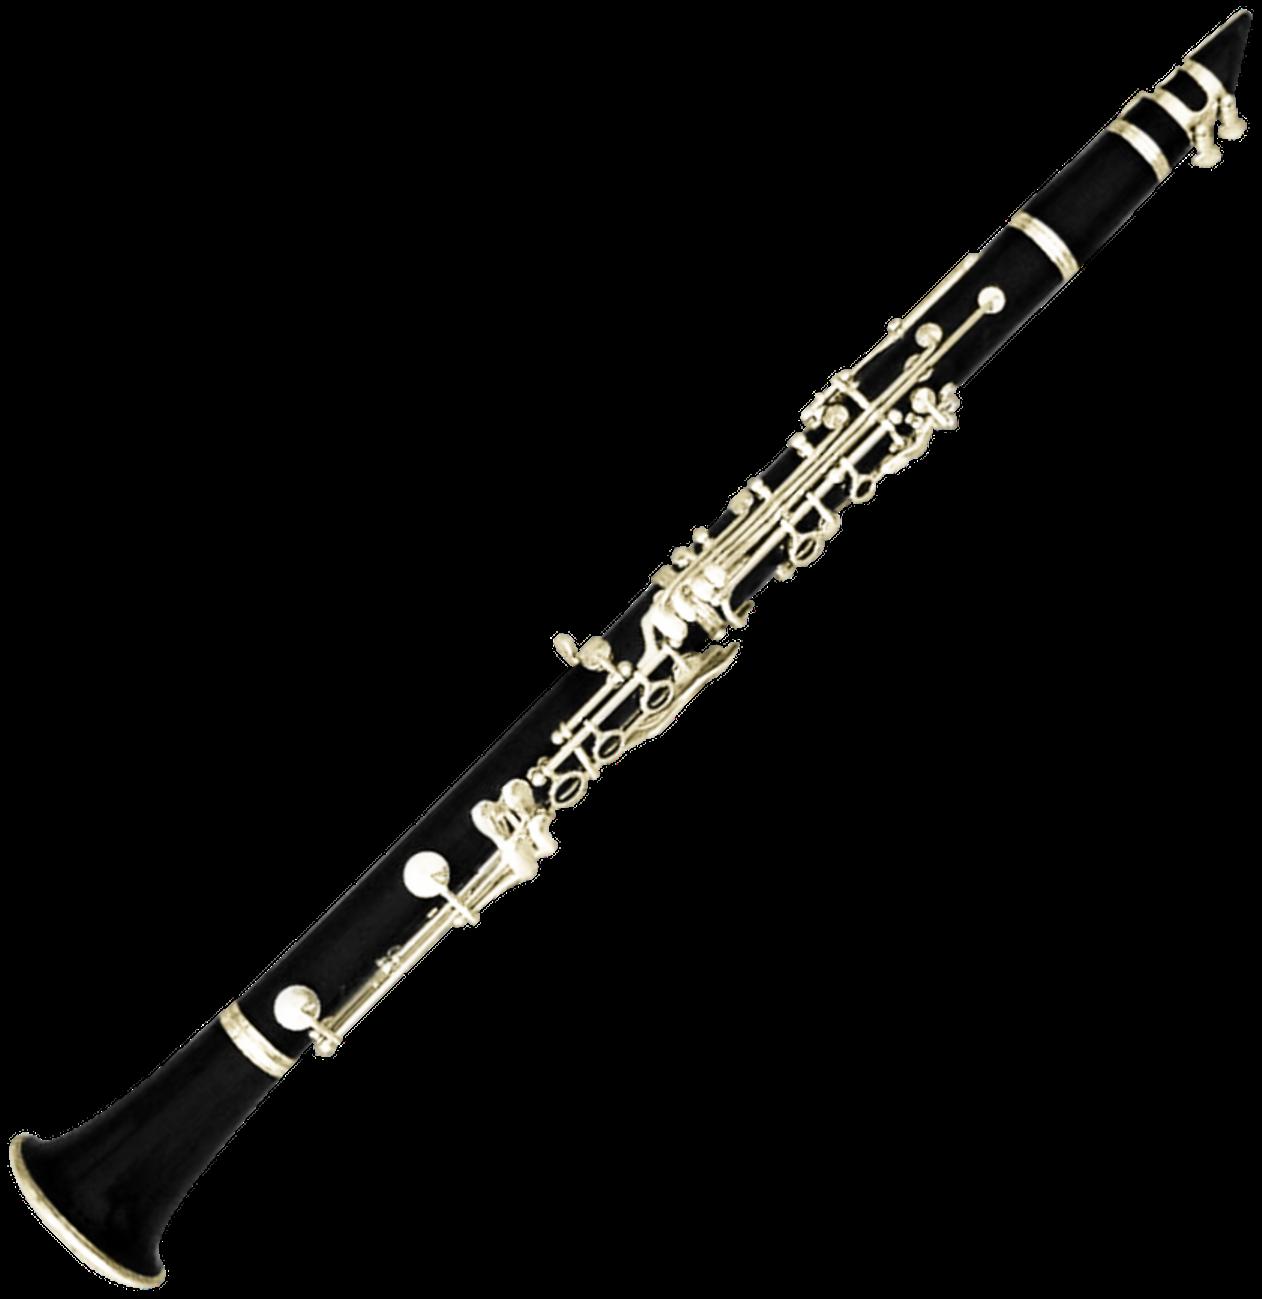 File:Clarinet.